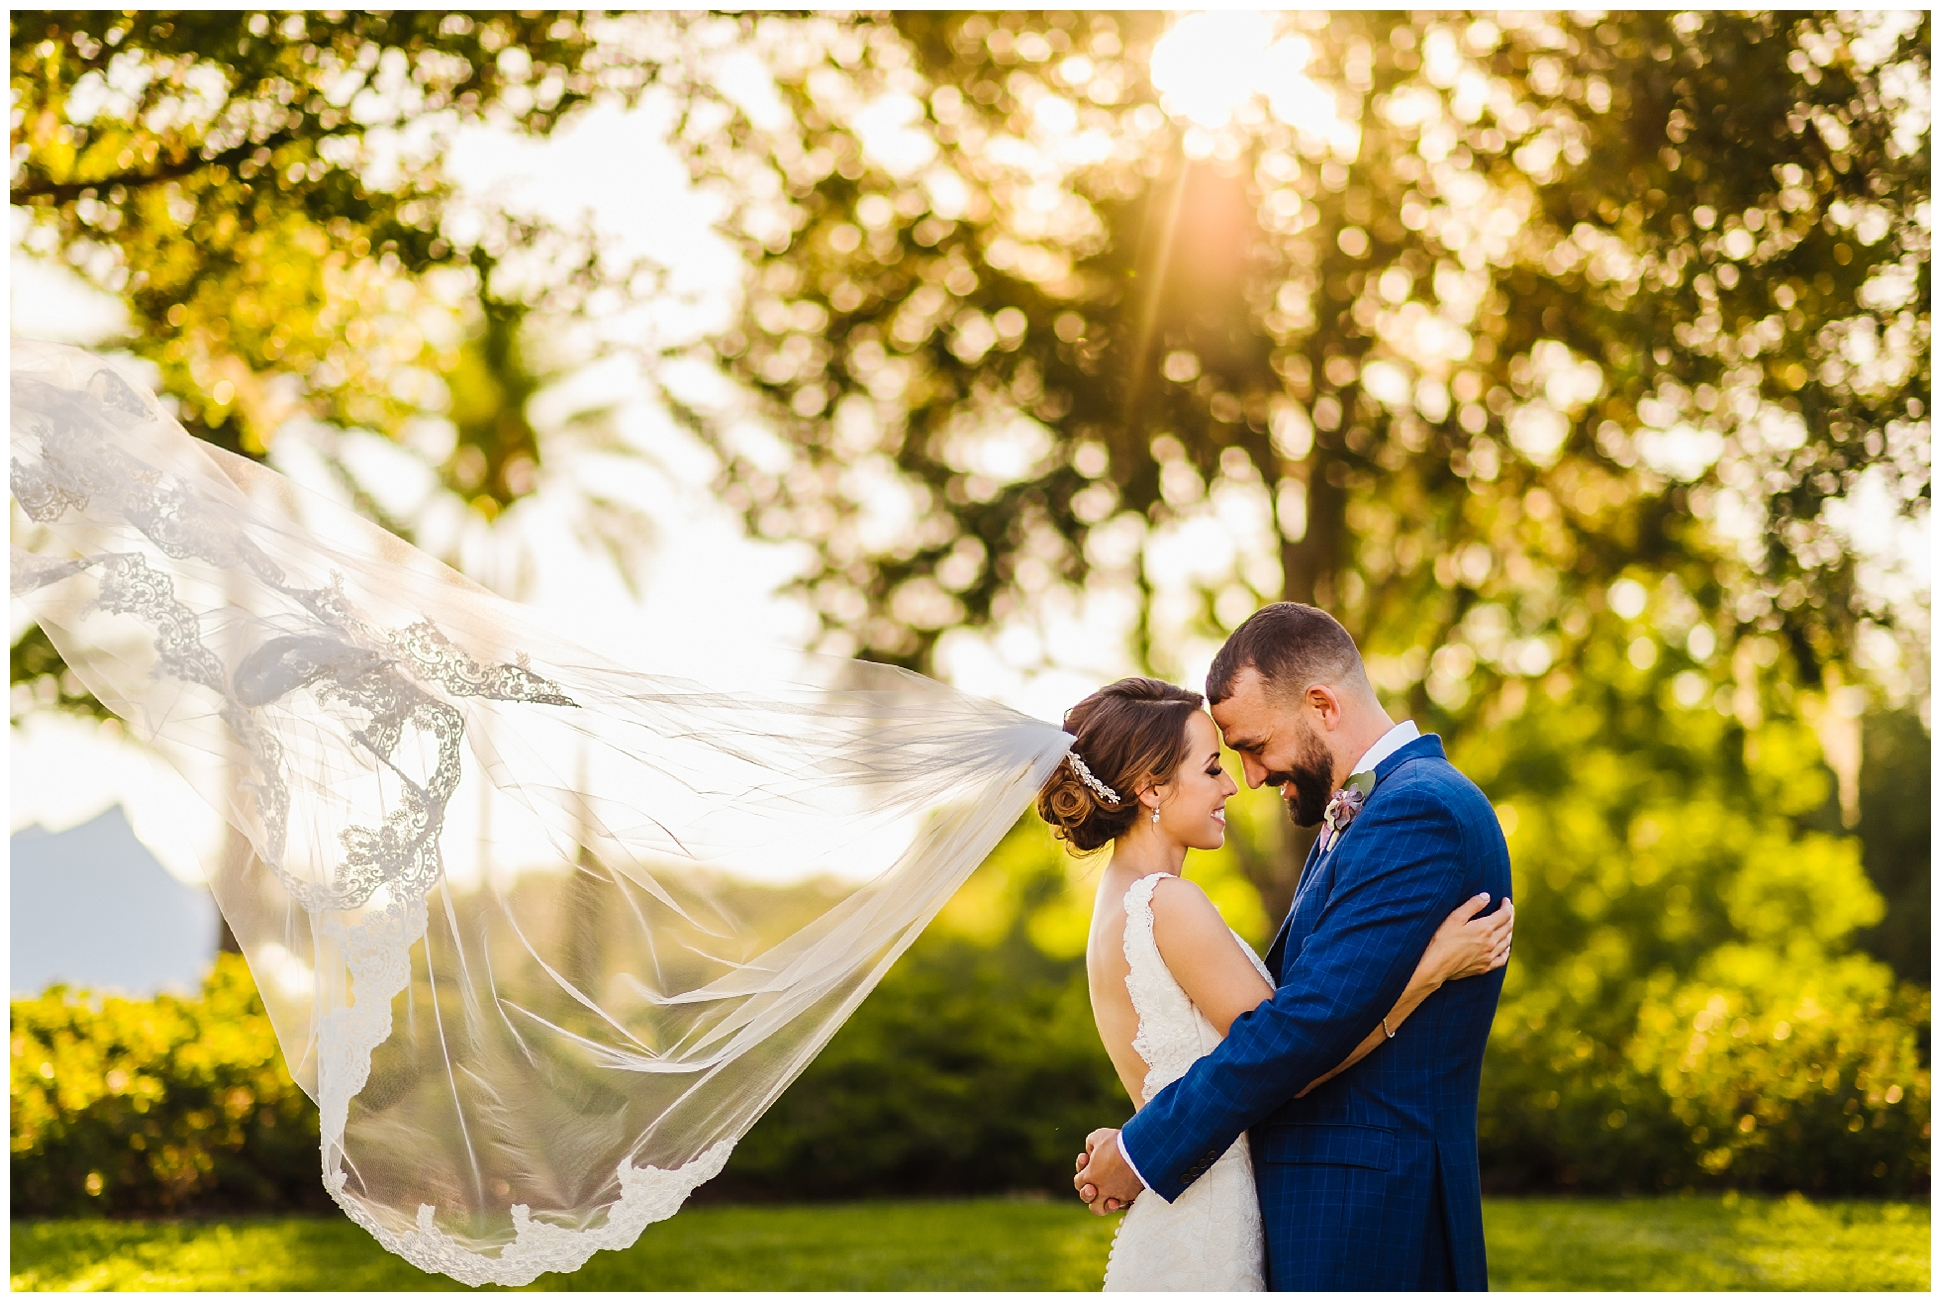 Tampa-luxury-wedding-photographer-mision-lago-private-estate_0040.jpg